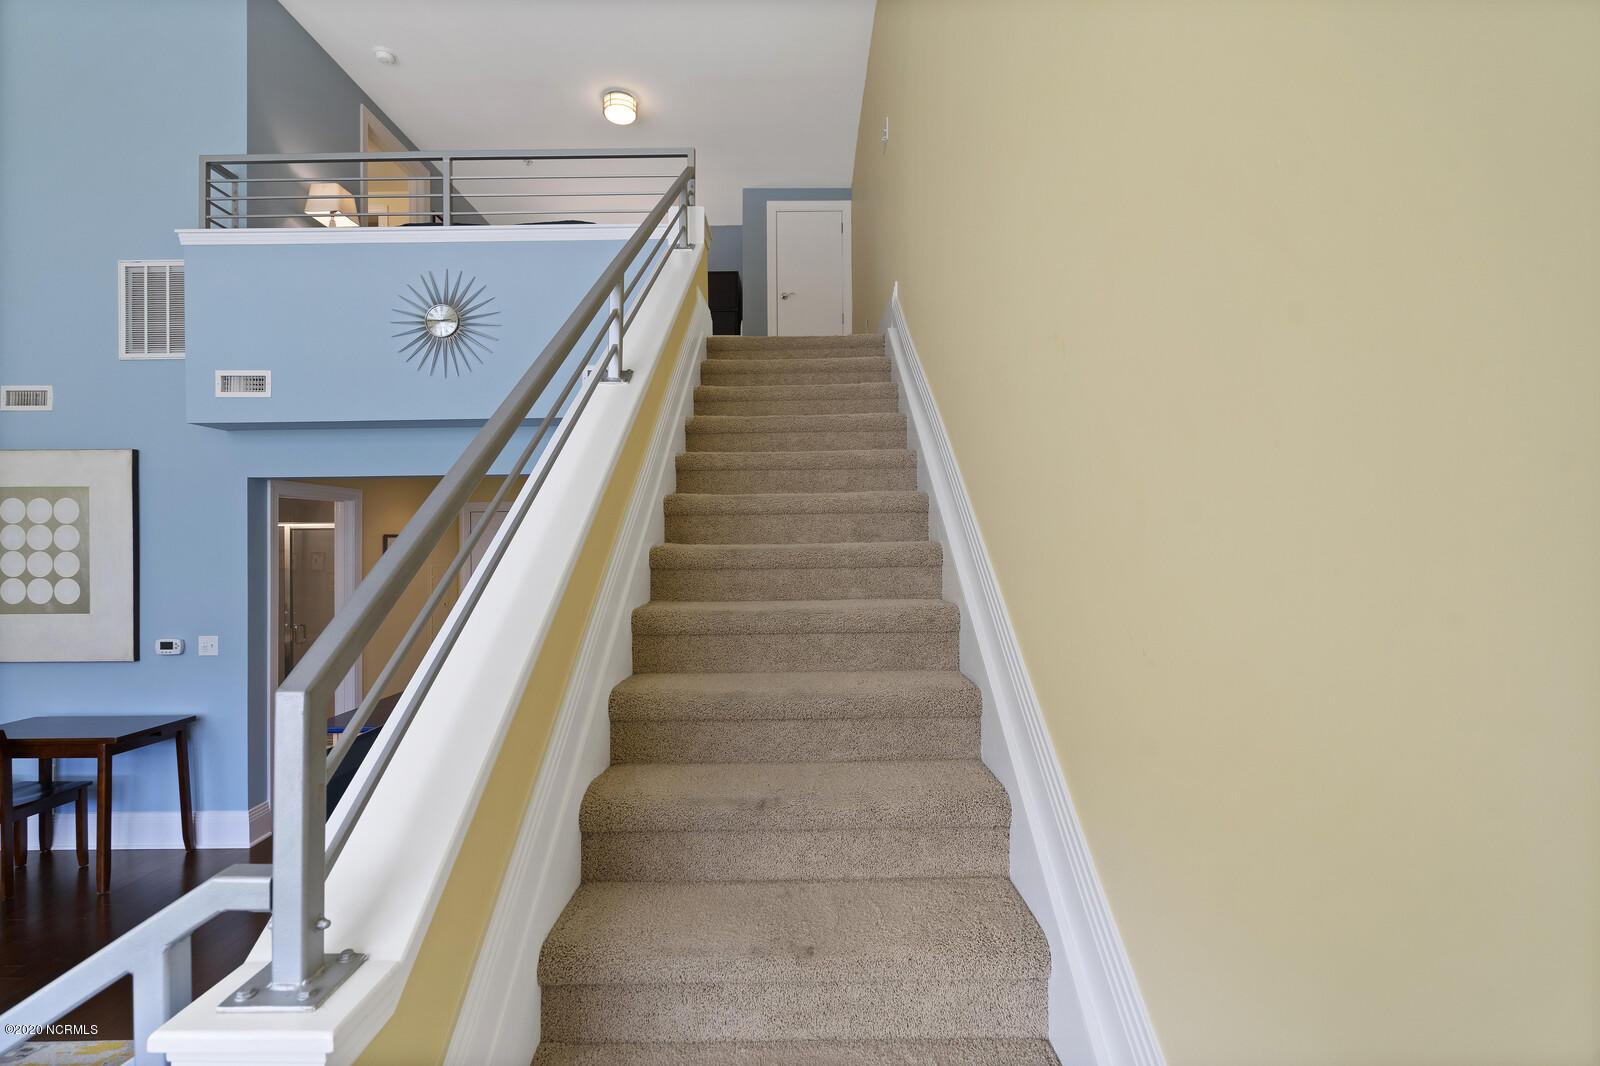 619 4th Street, Wilmington, North Carolina 28401, 1 Bedroom Bedrooms, 3 Rooms Rooms,1 BathroomBathrooms,Condominium,For sale,4th,100231386